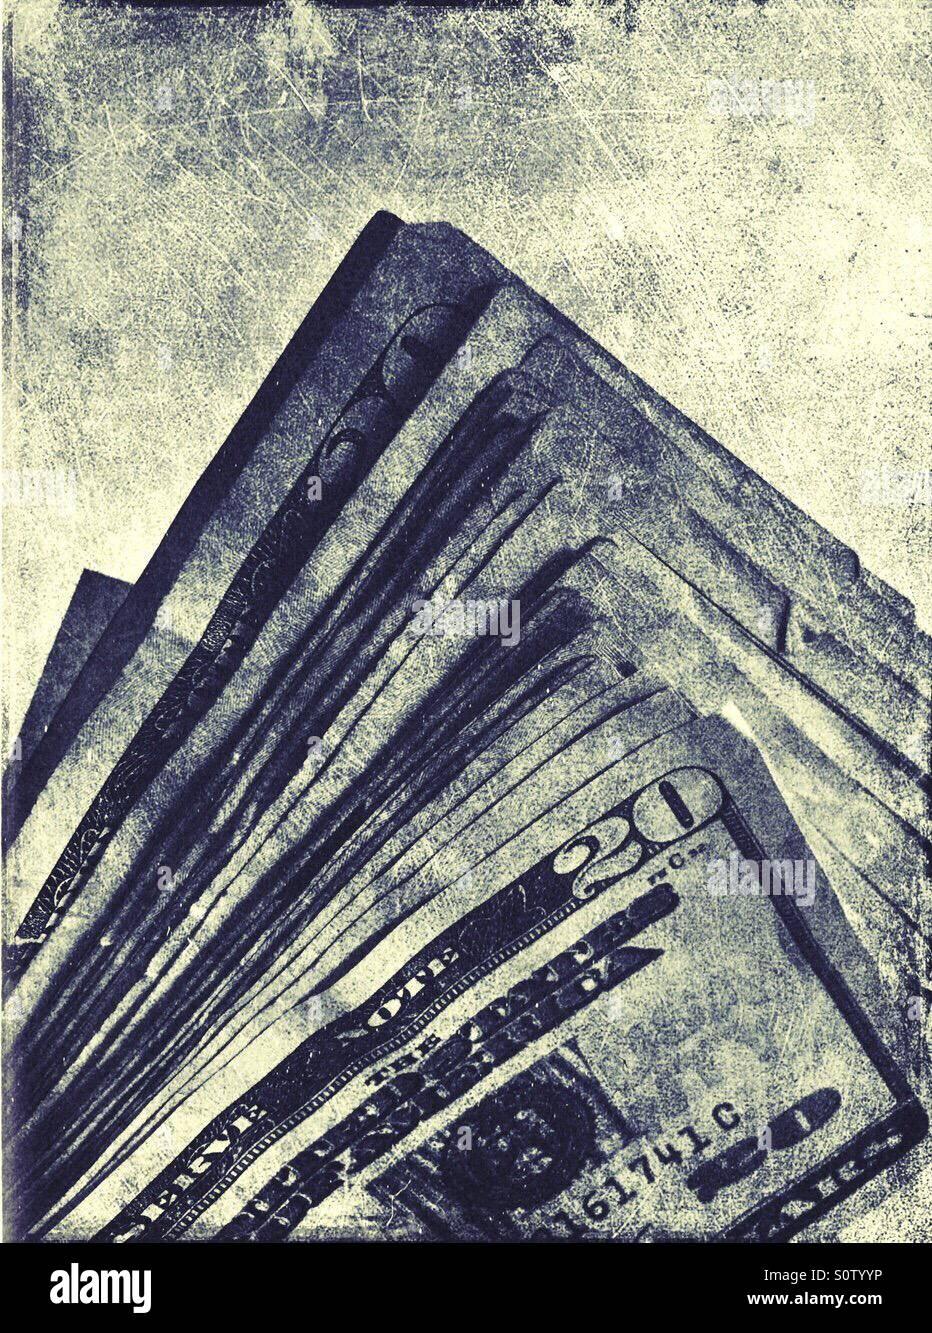 Stack of five hundred American dollars in twenty dollar bills - Stock Image